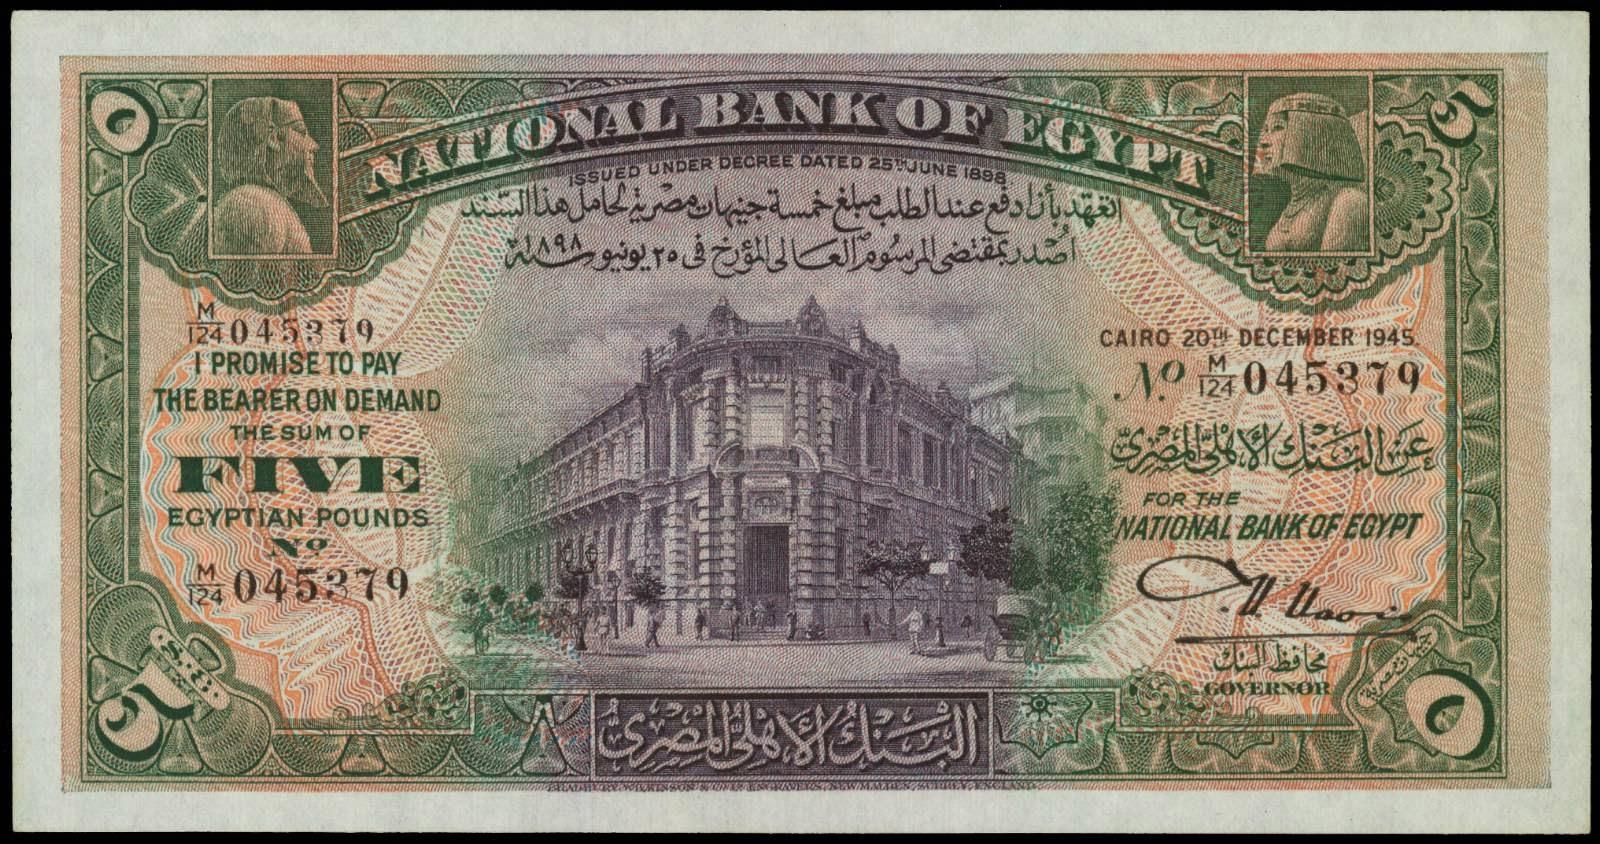 Egyptian Pound banknotes 5 Pounds note 1945